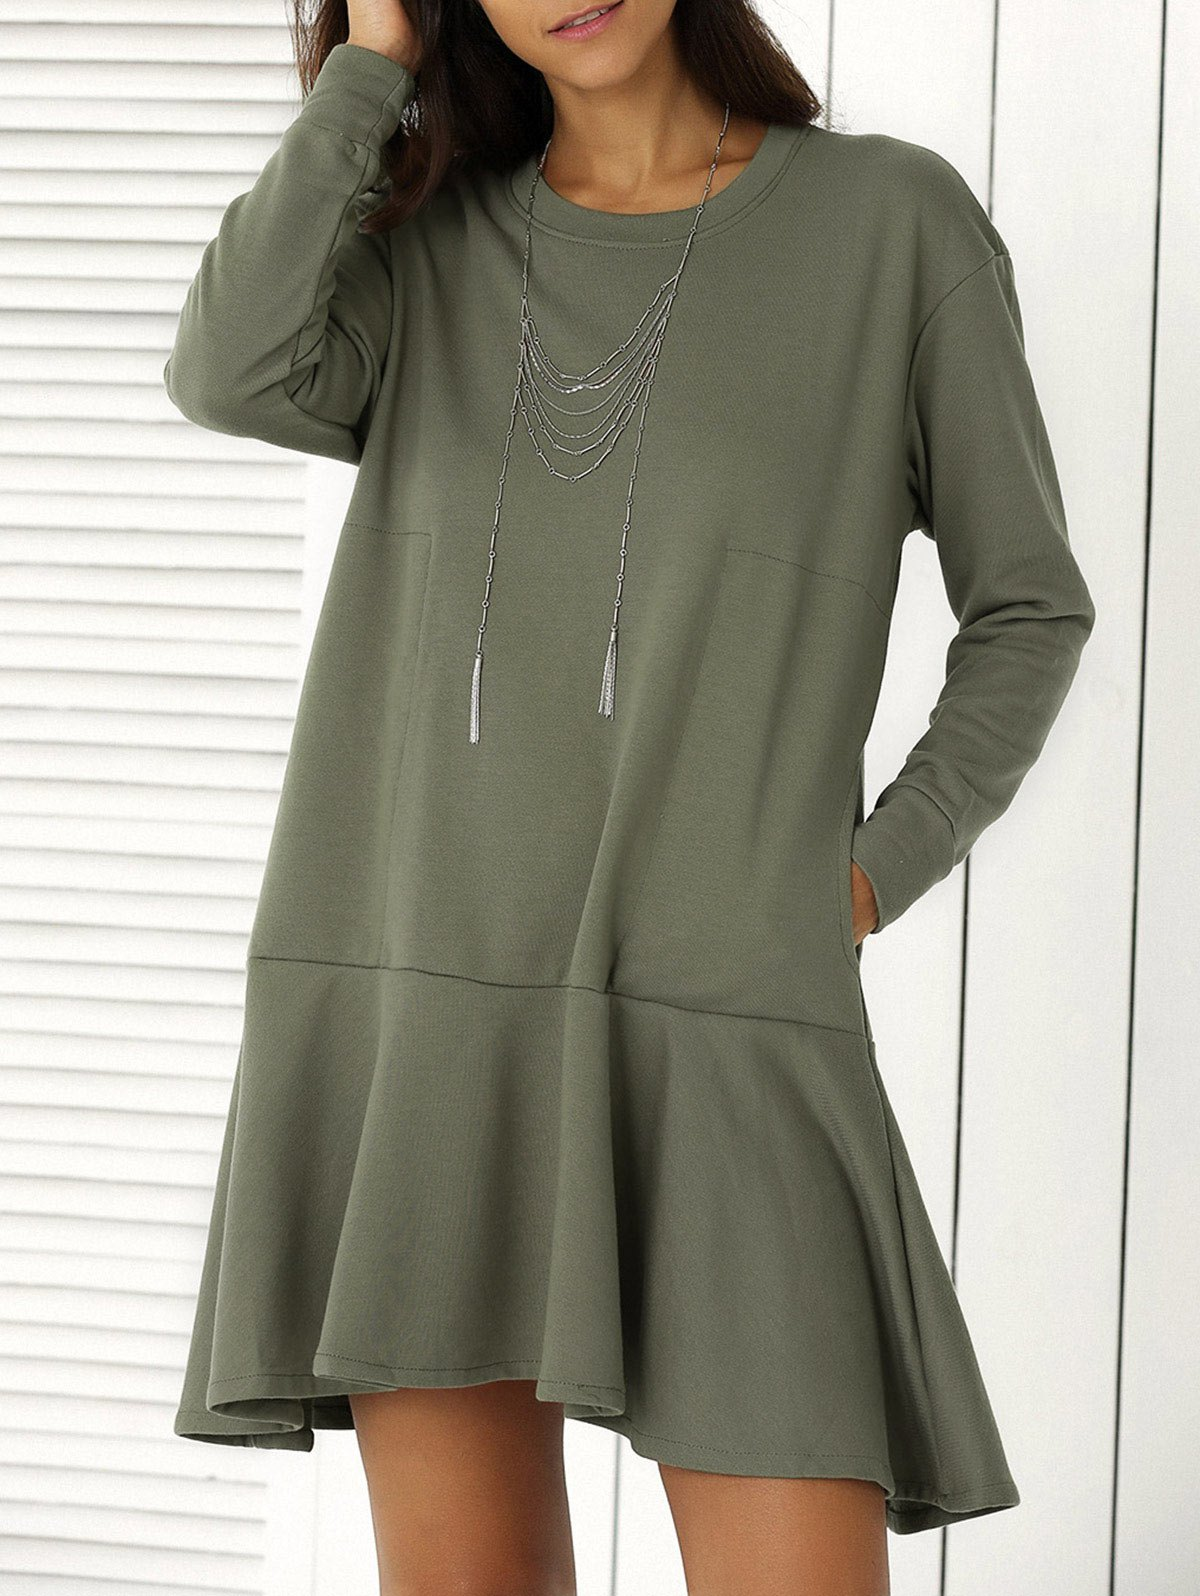 Solid Color Ruffle Hem Sweatshirt Dress 190140903